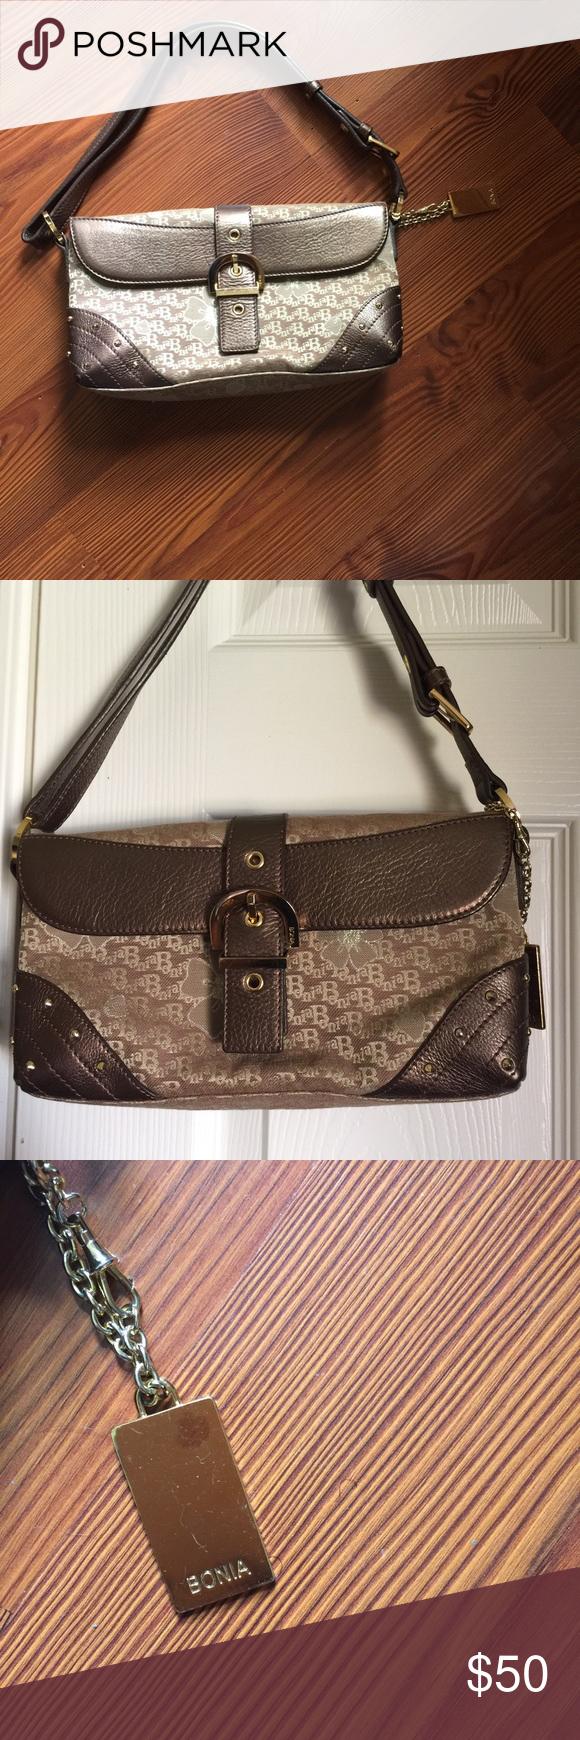 b6d295ef47 Authentic Bonia Italian Purse Very cute purse made in Italy bonia Bags Mini  Bags